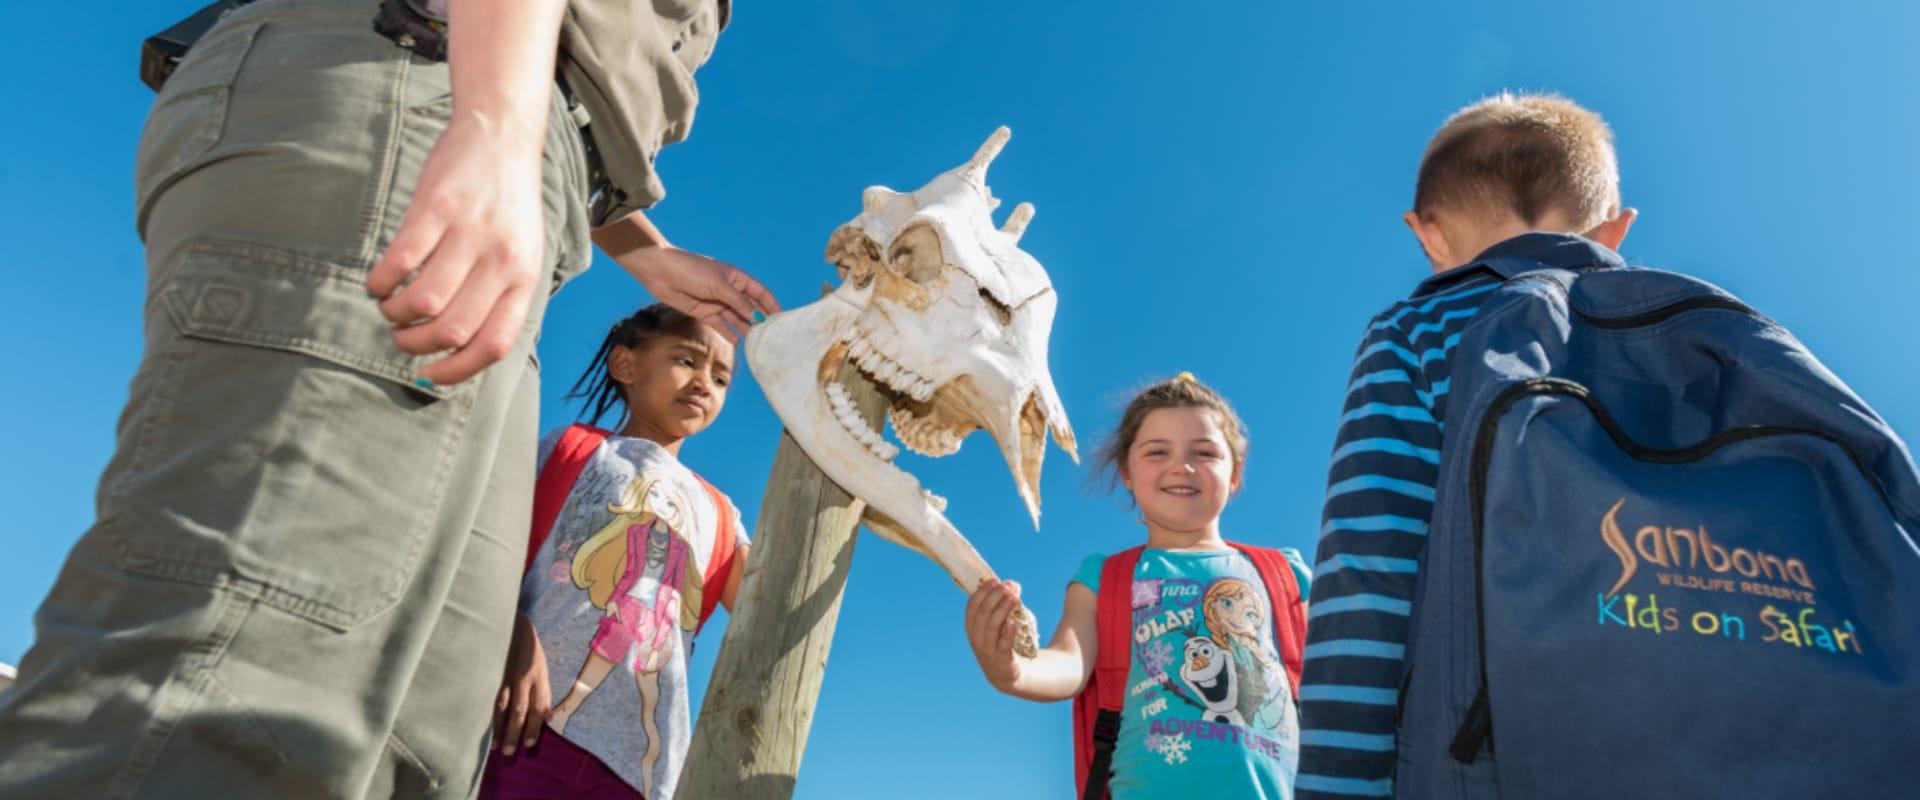 Kids on Safari programs keep little ones happy